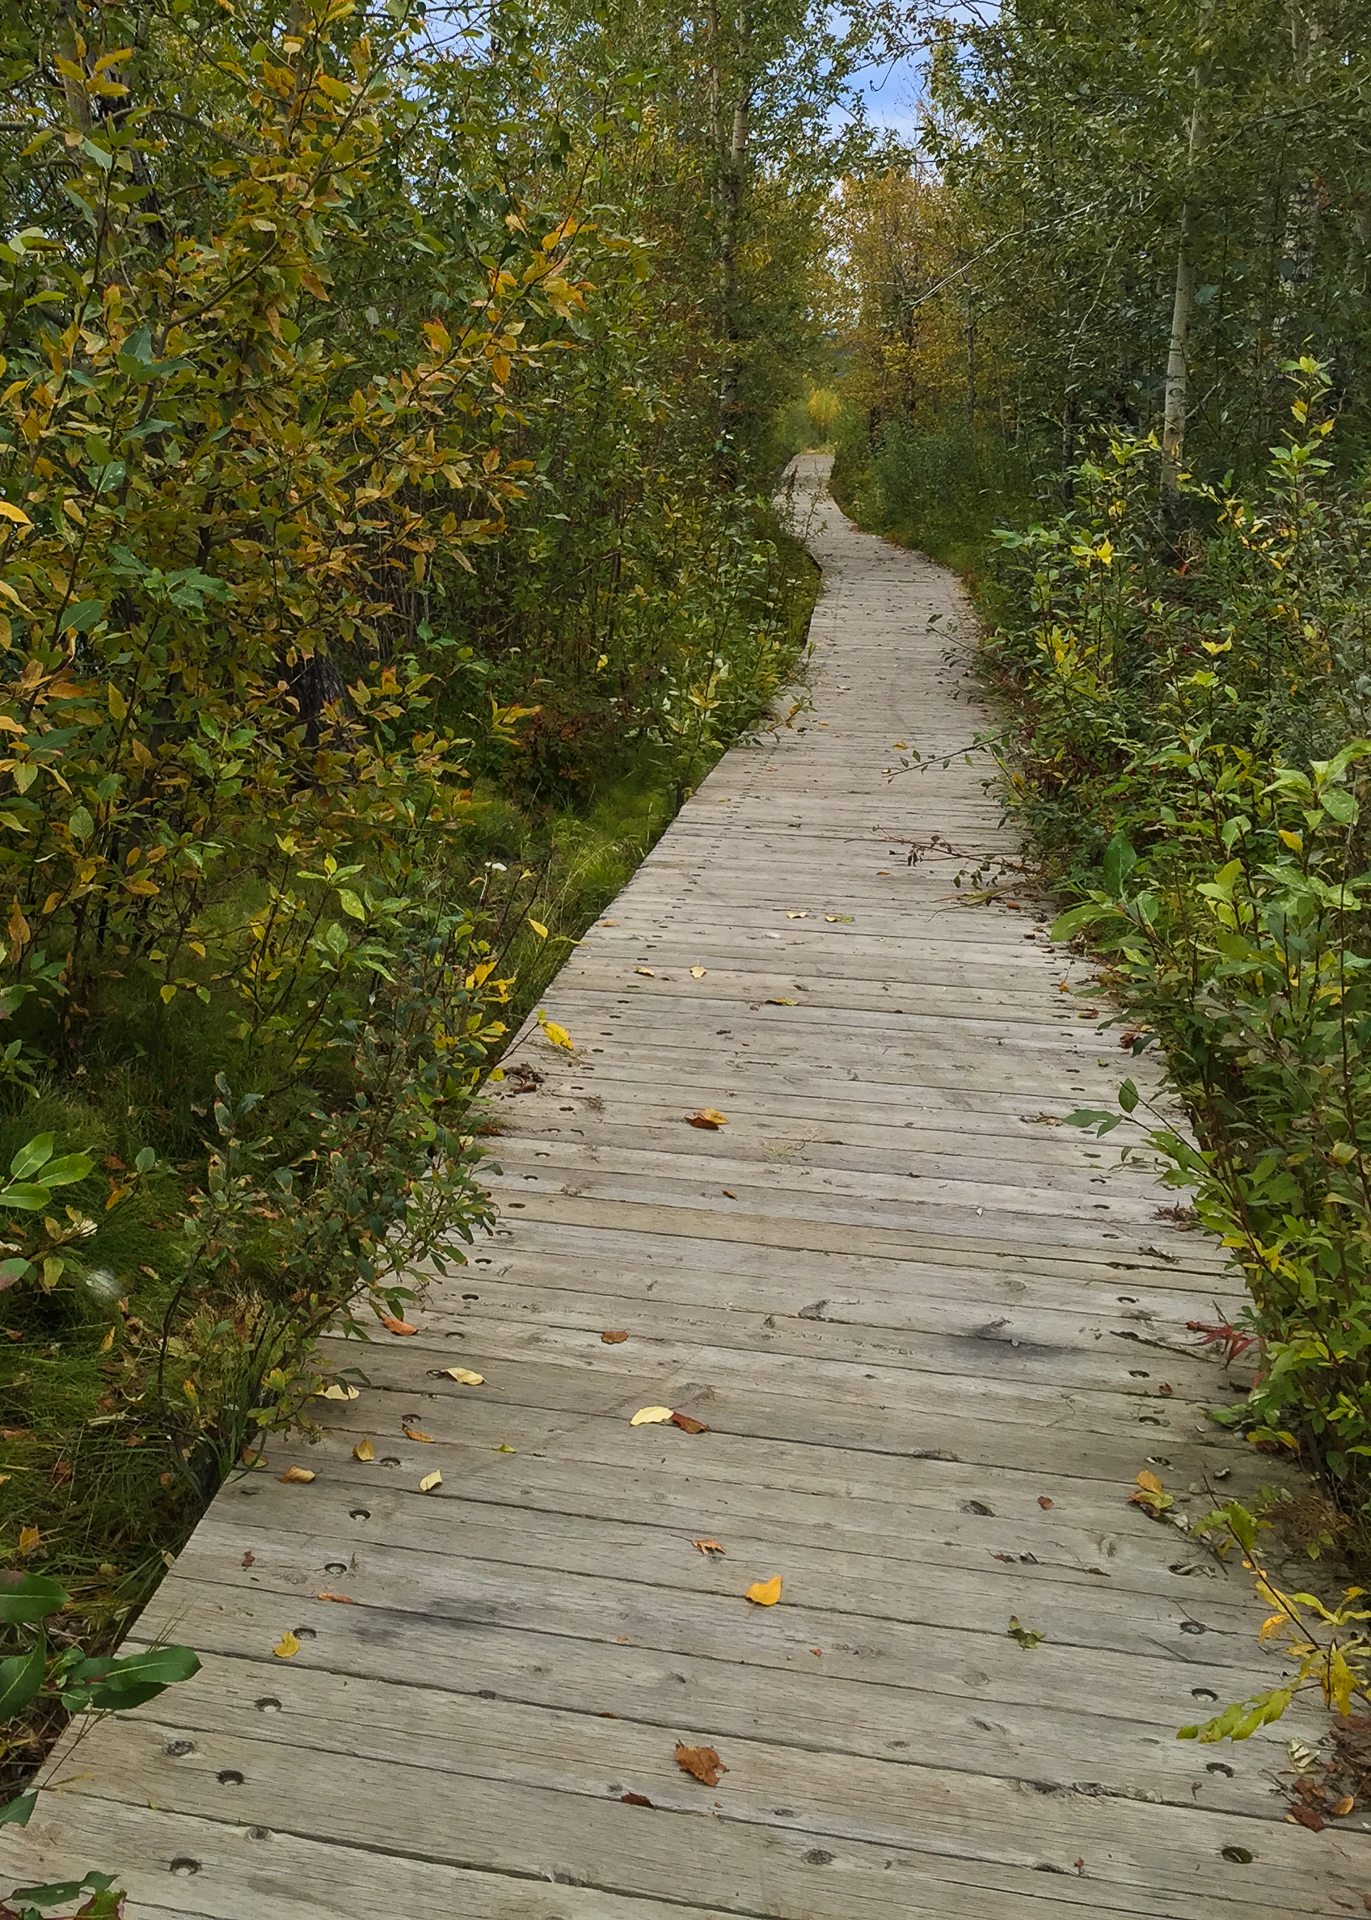 The riverside boardwalk in Carmacks.